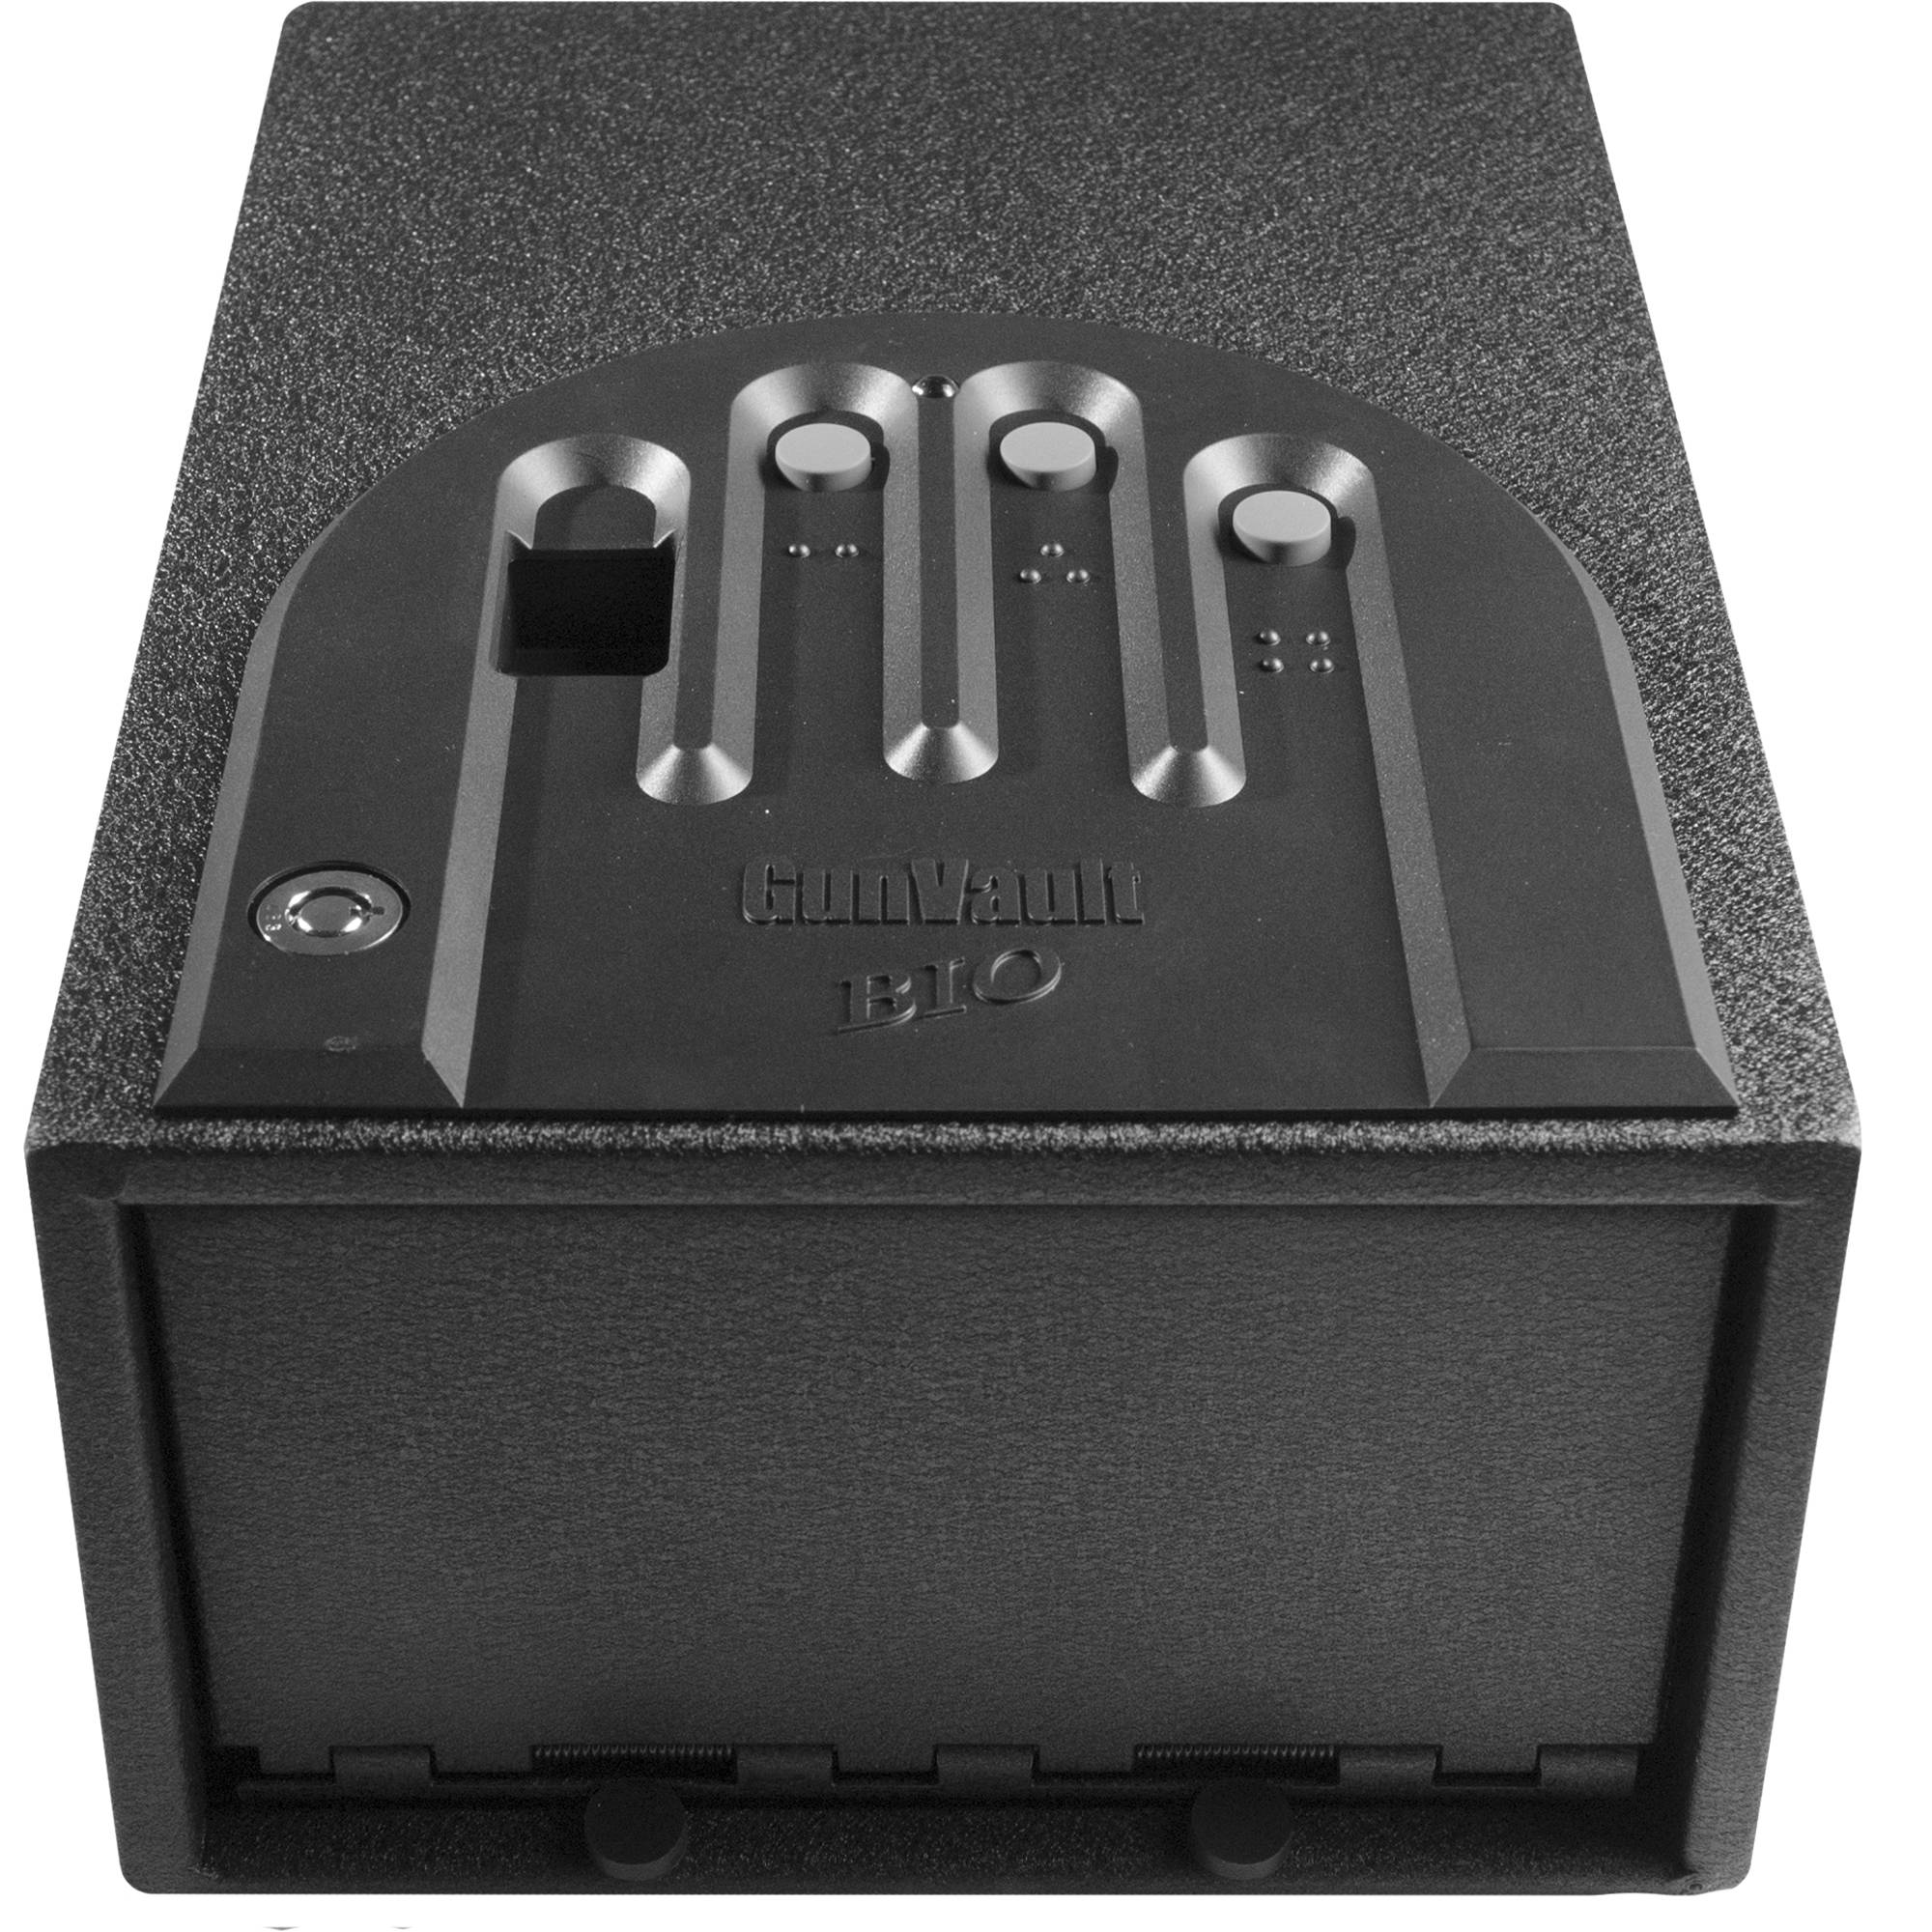 GunVault MiniVault Biometric Gun Safe